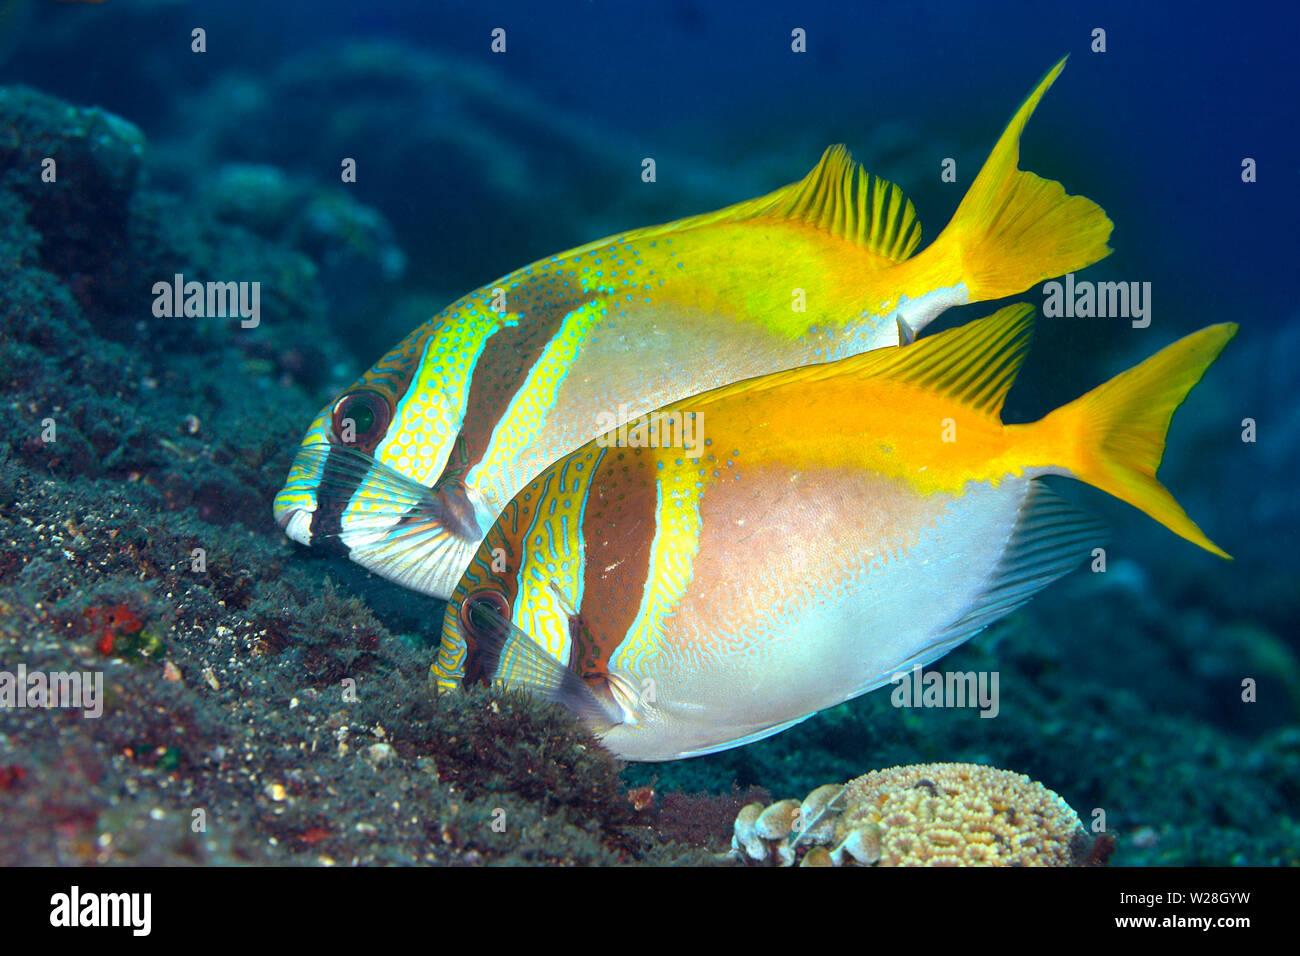 doublebar-rabbitfish-also-known-as-two-barred-rabbitfish-virgate-rabbitfish-and-barhead-spinefoot-siganus-virgatus-tulamben-bali-indonesia-W28GYW.jpg